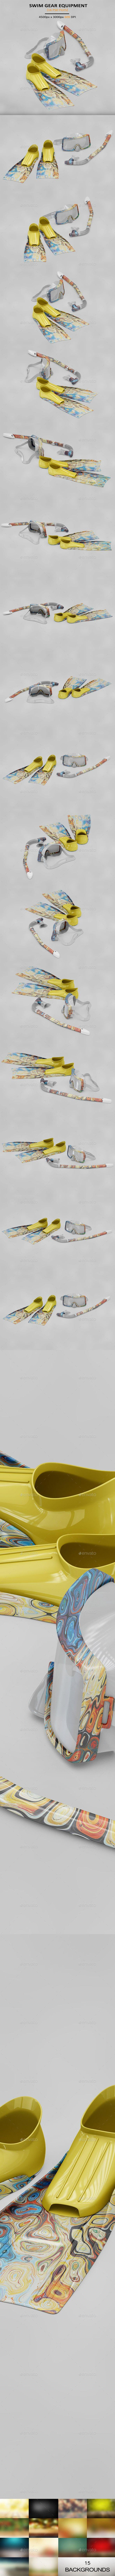 034bcc5c3e3 Swim Gear Equipment MockUp - Product #Mock-Ups Graphics | Product ...